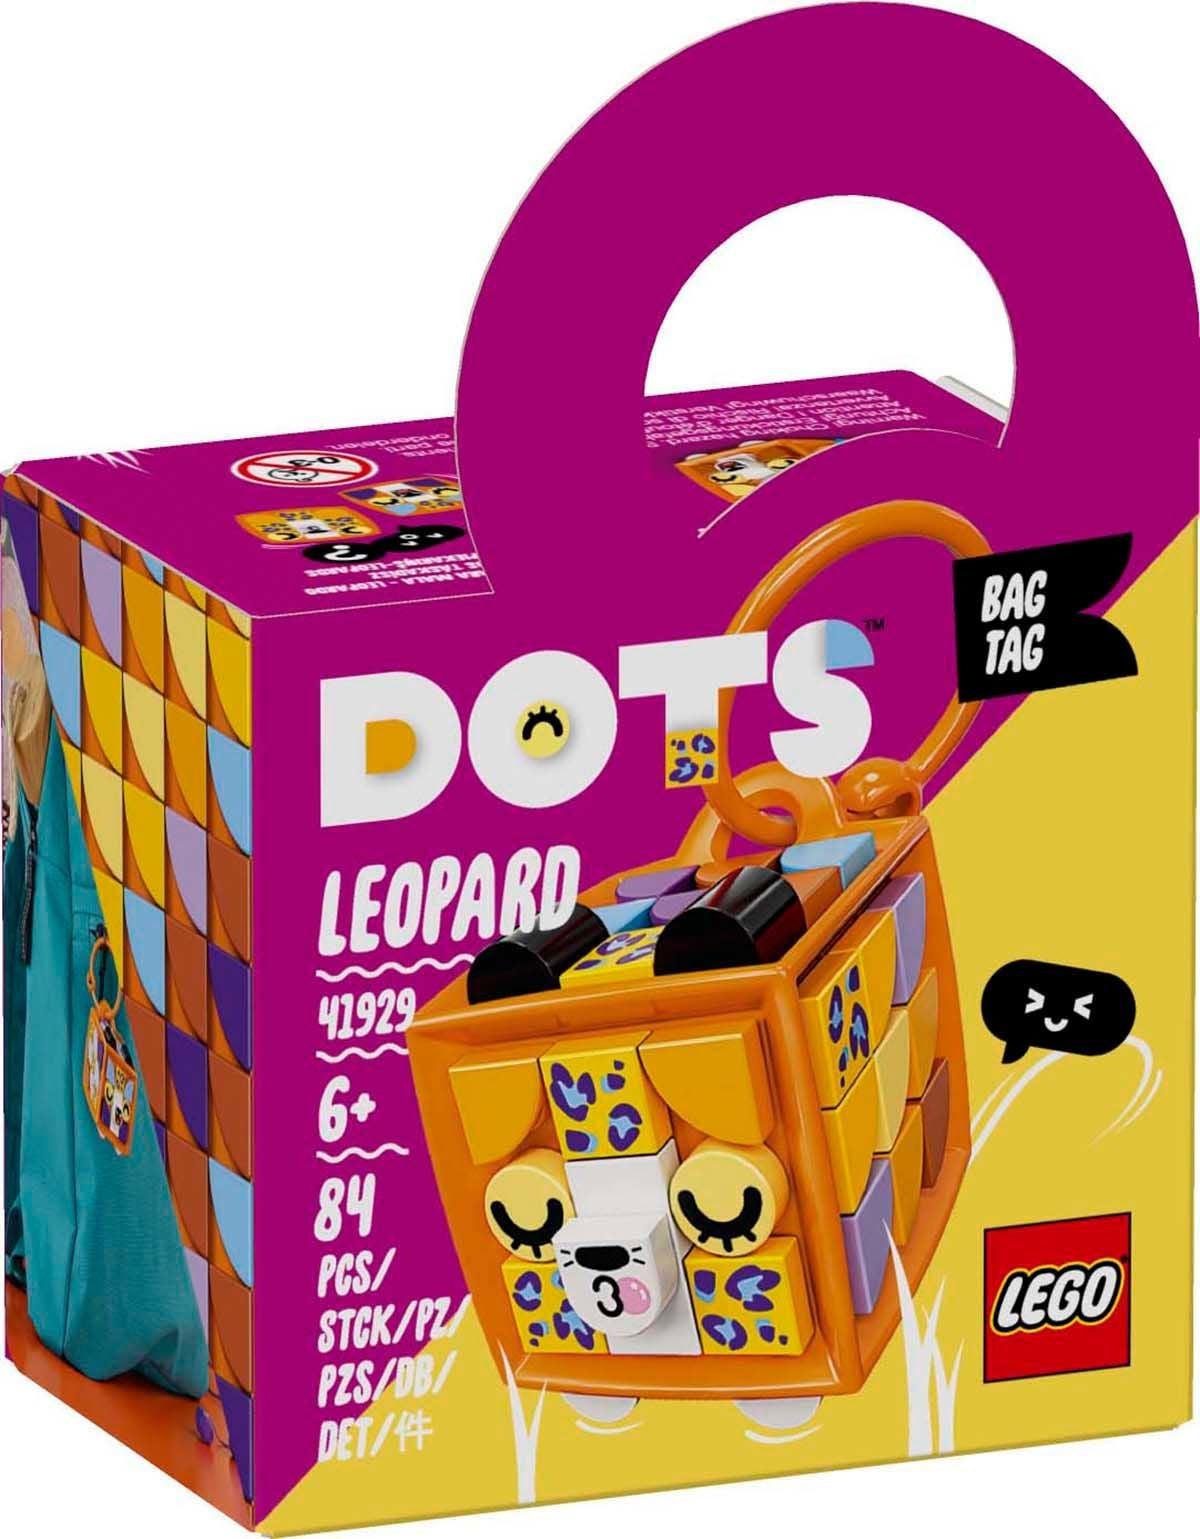 LEGO DOTS 41929 Bagagetagg - Leopard